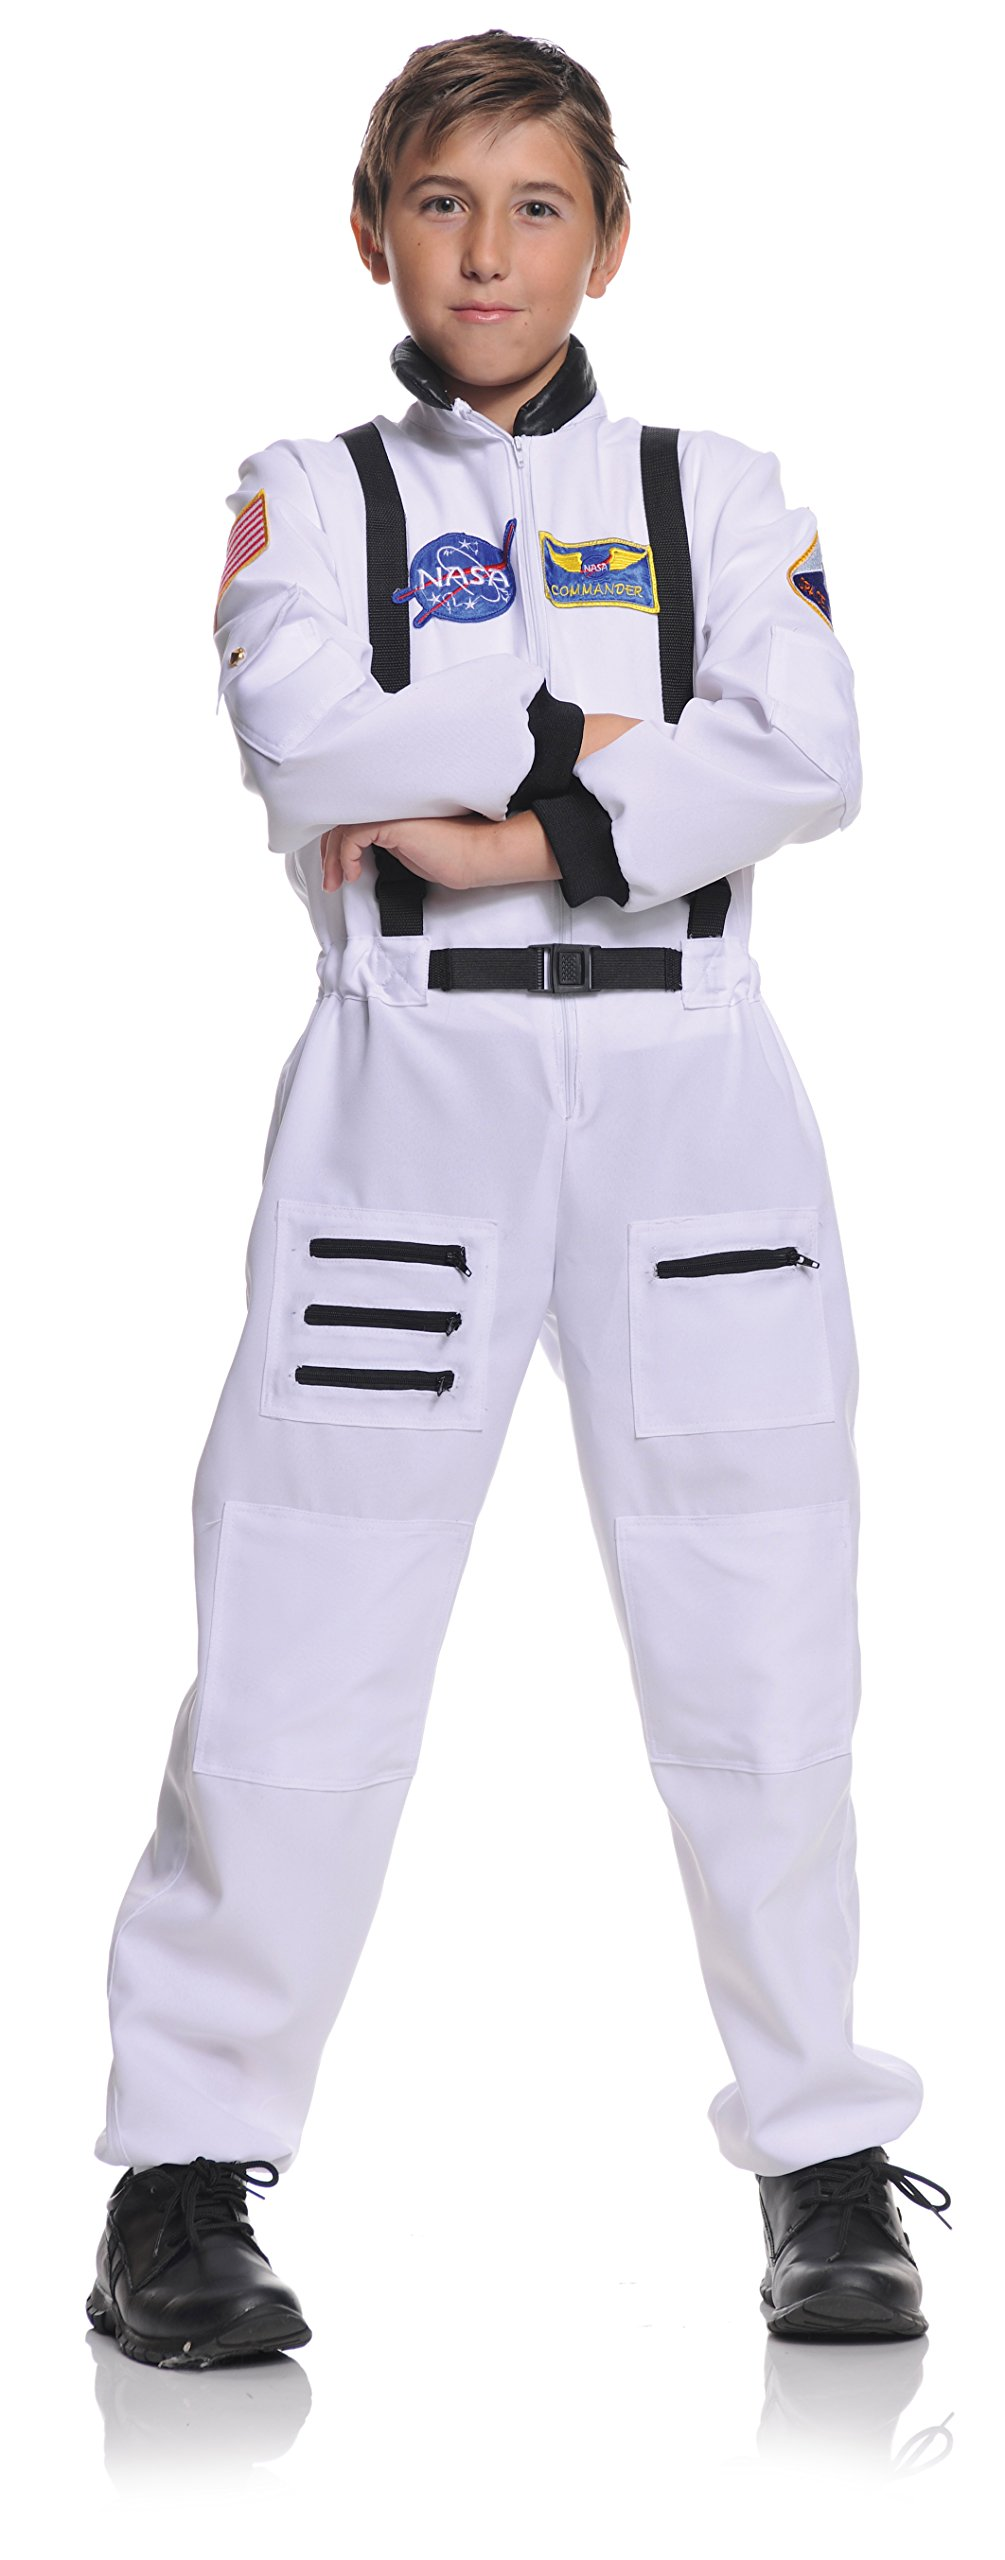 Children's Astronaut Costume - White, Large (10-12)